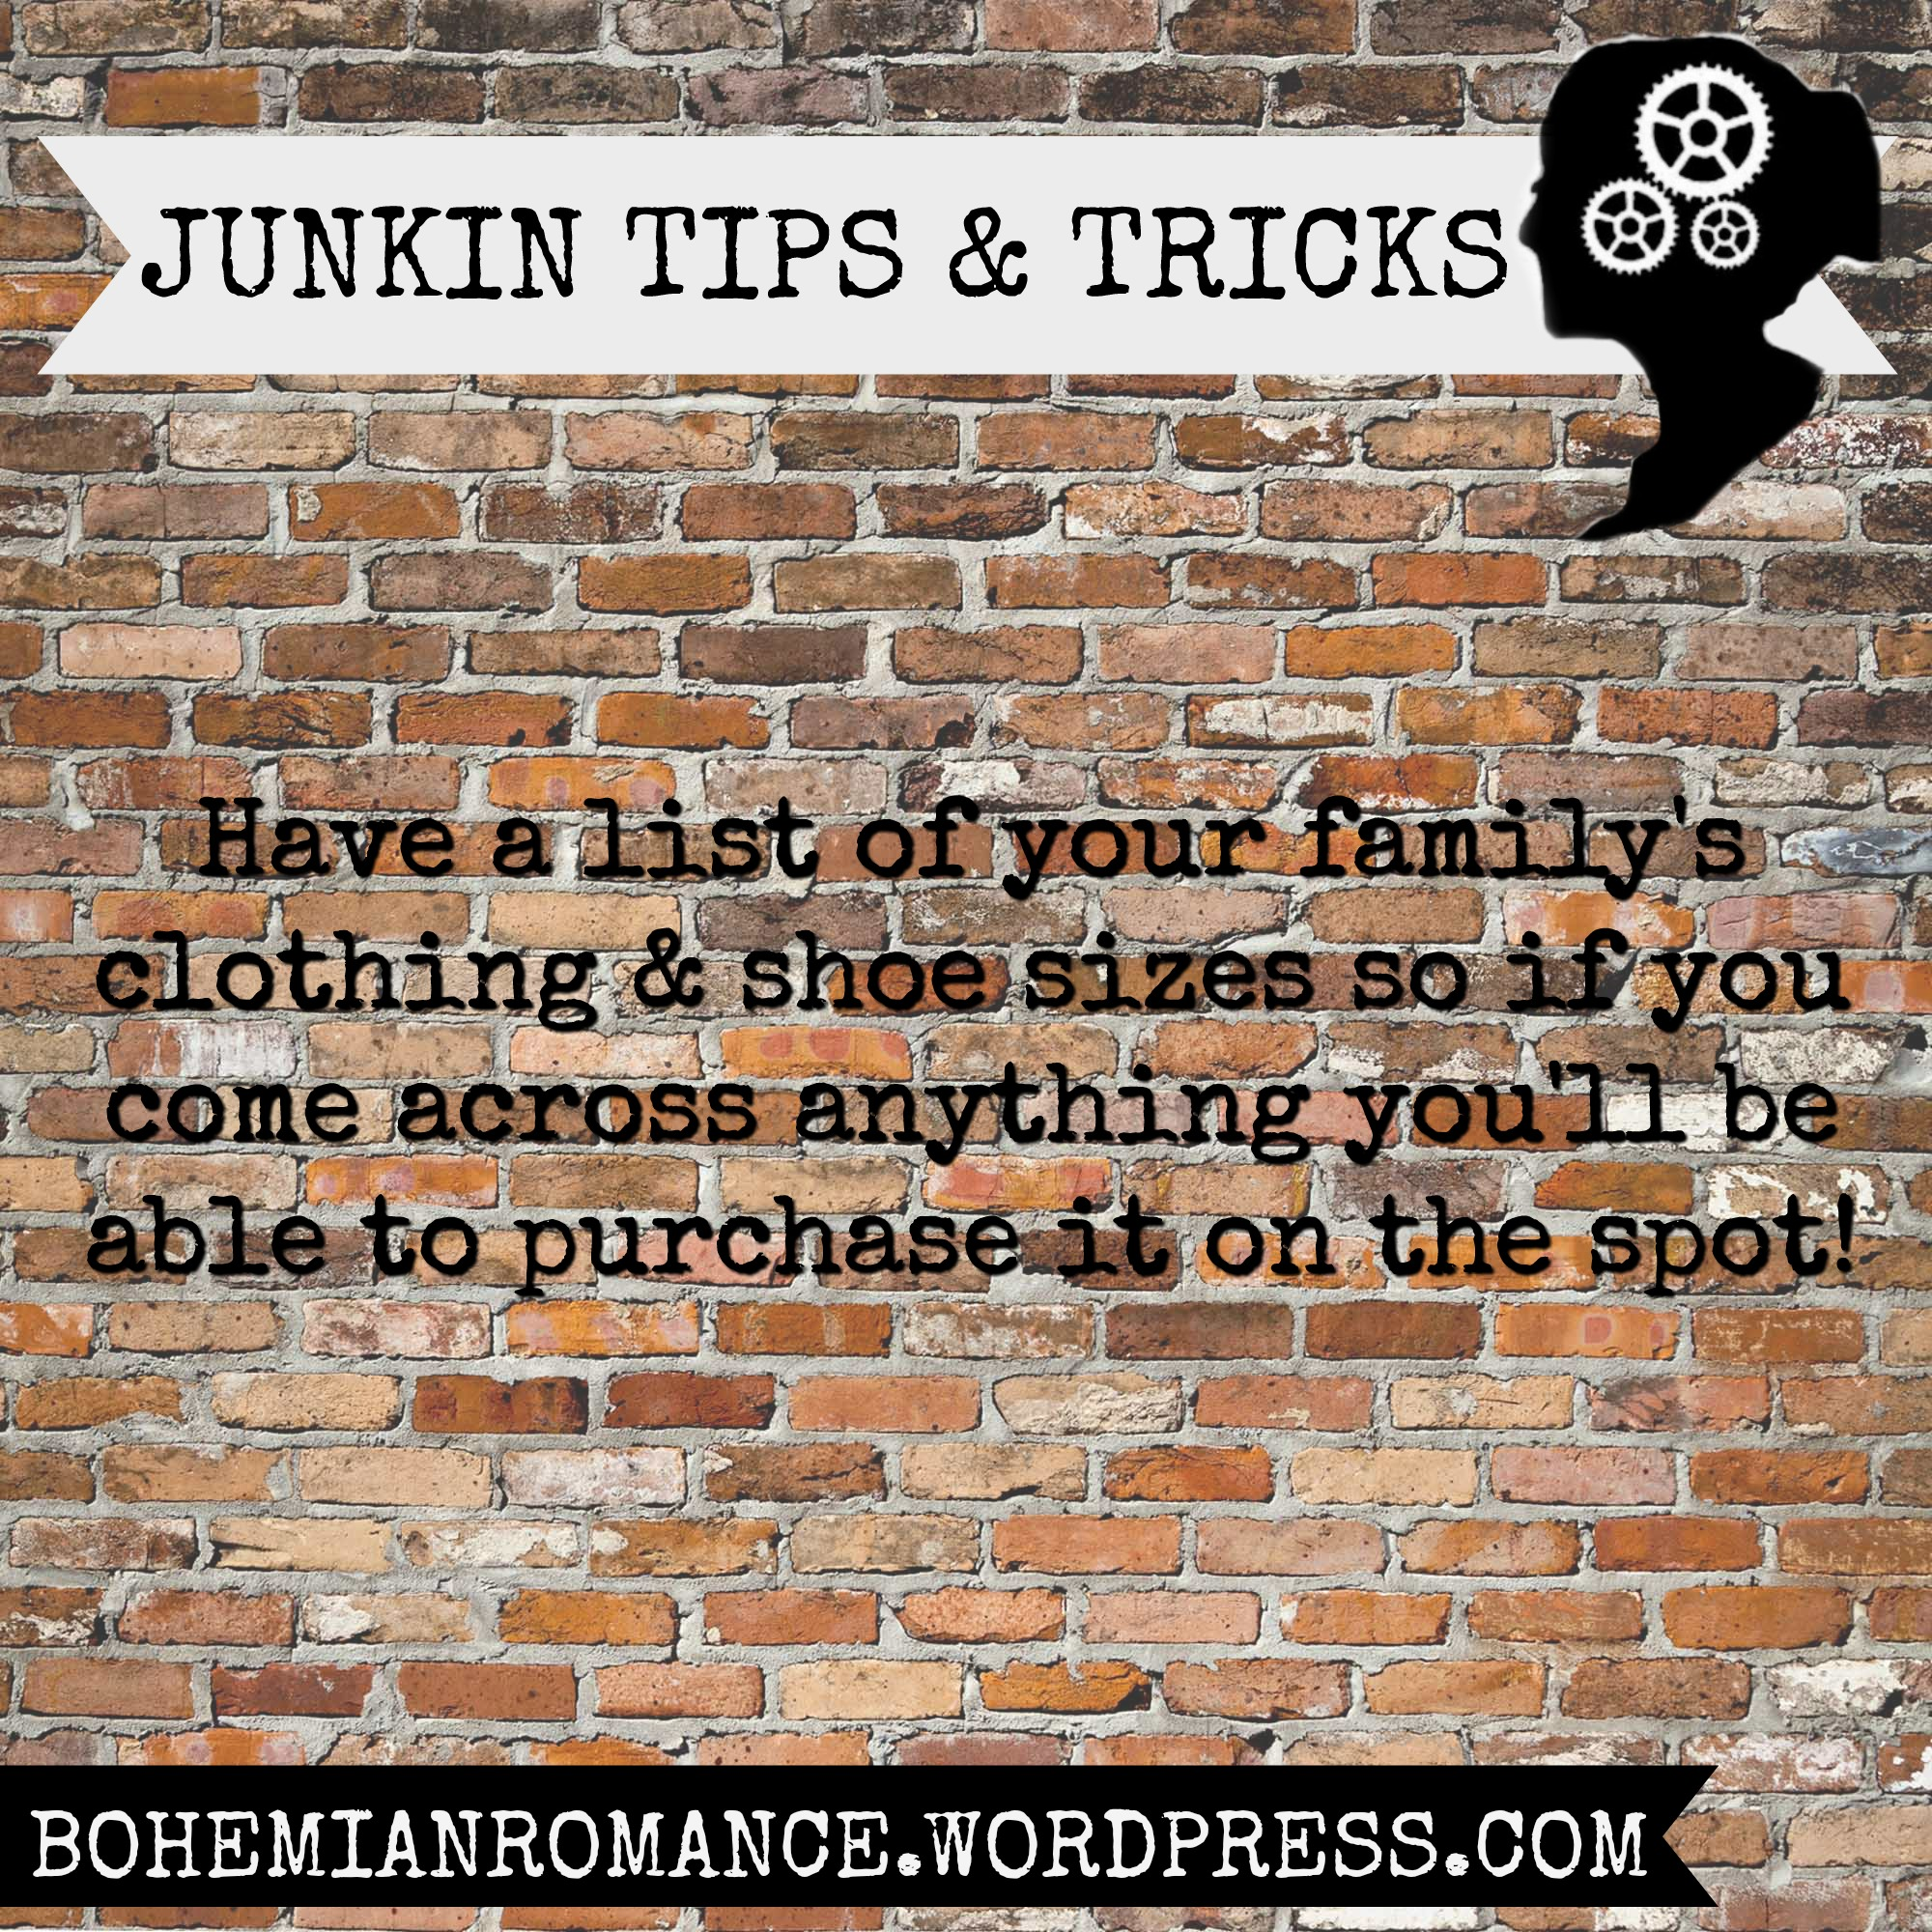 17-junkin-tips-tricks-template